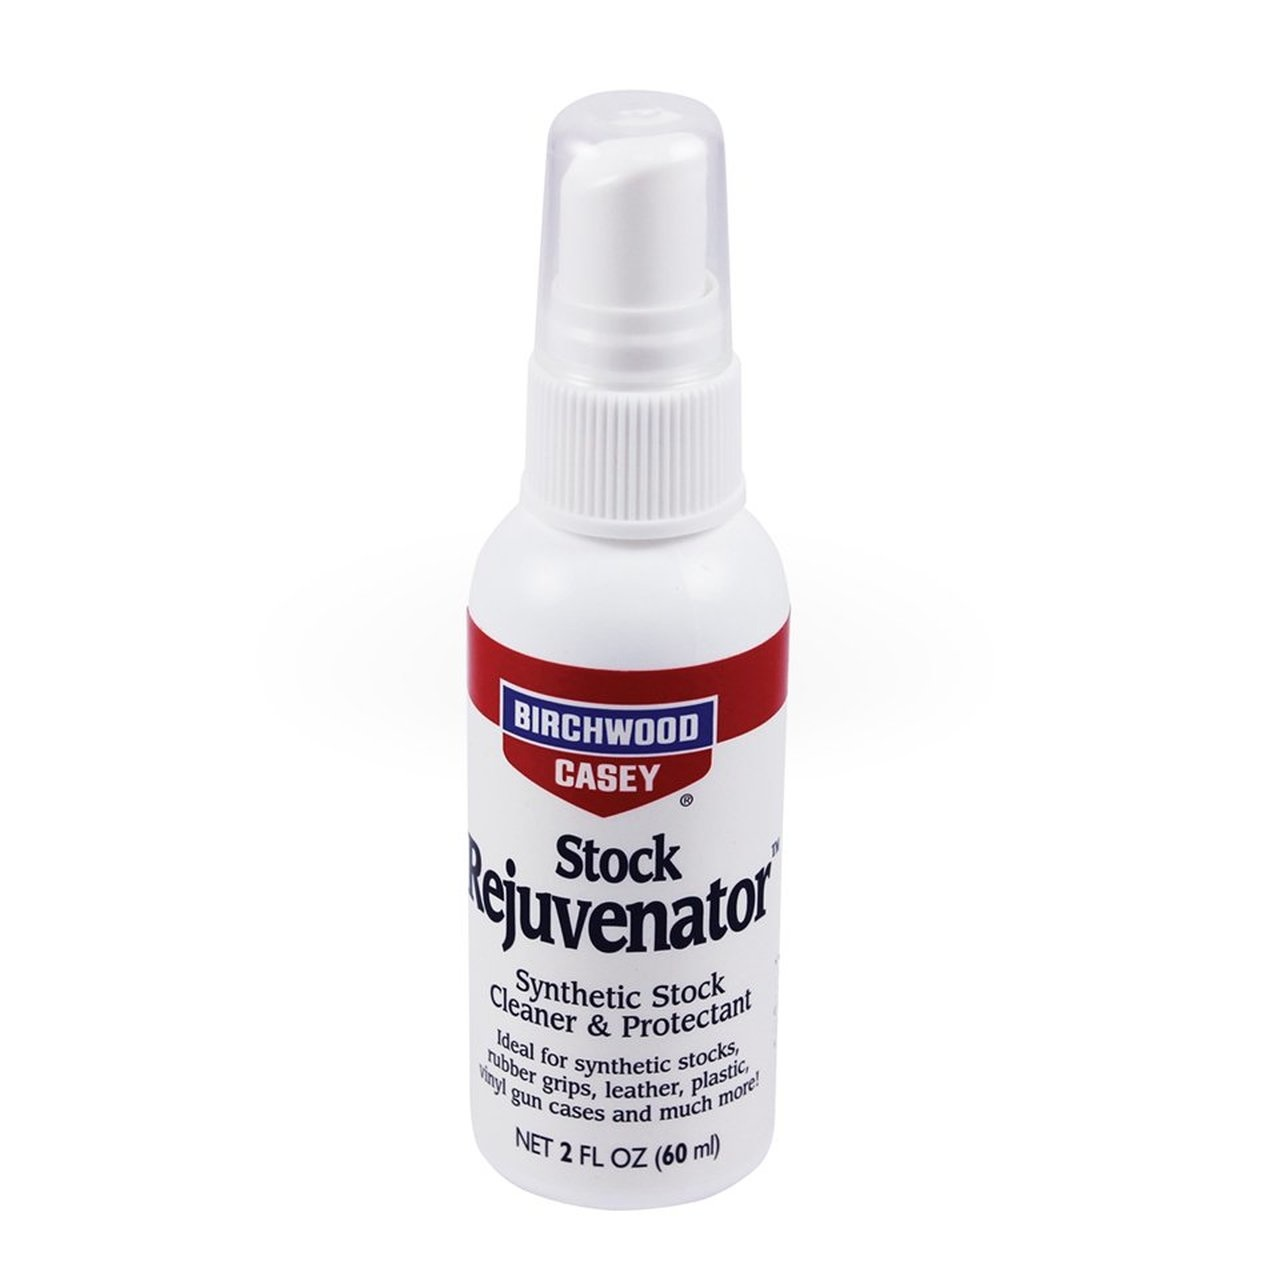 Birchwood Casey Birchwood Casey Stock Rejuvenator Synthetic Stock Cleaner & Protectant 2 FL Oz Spray